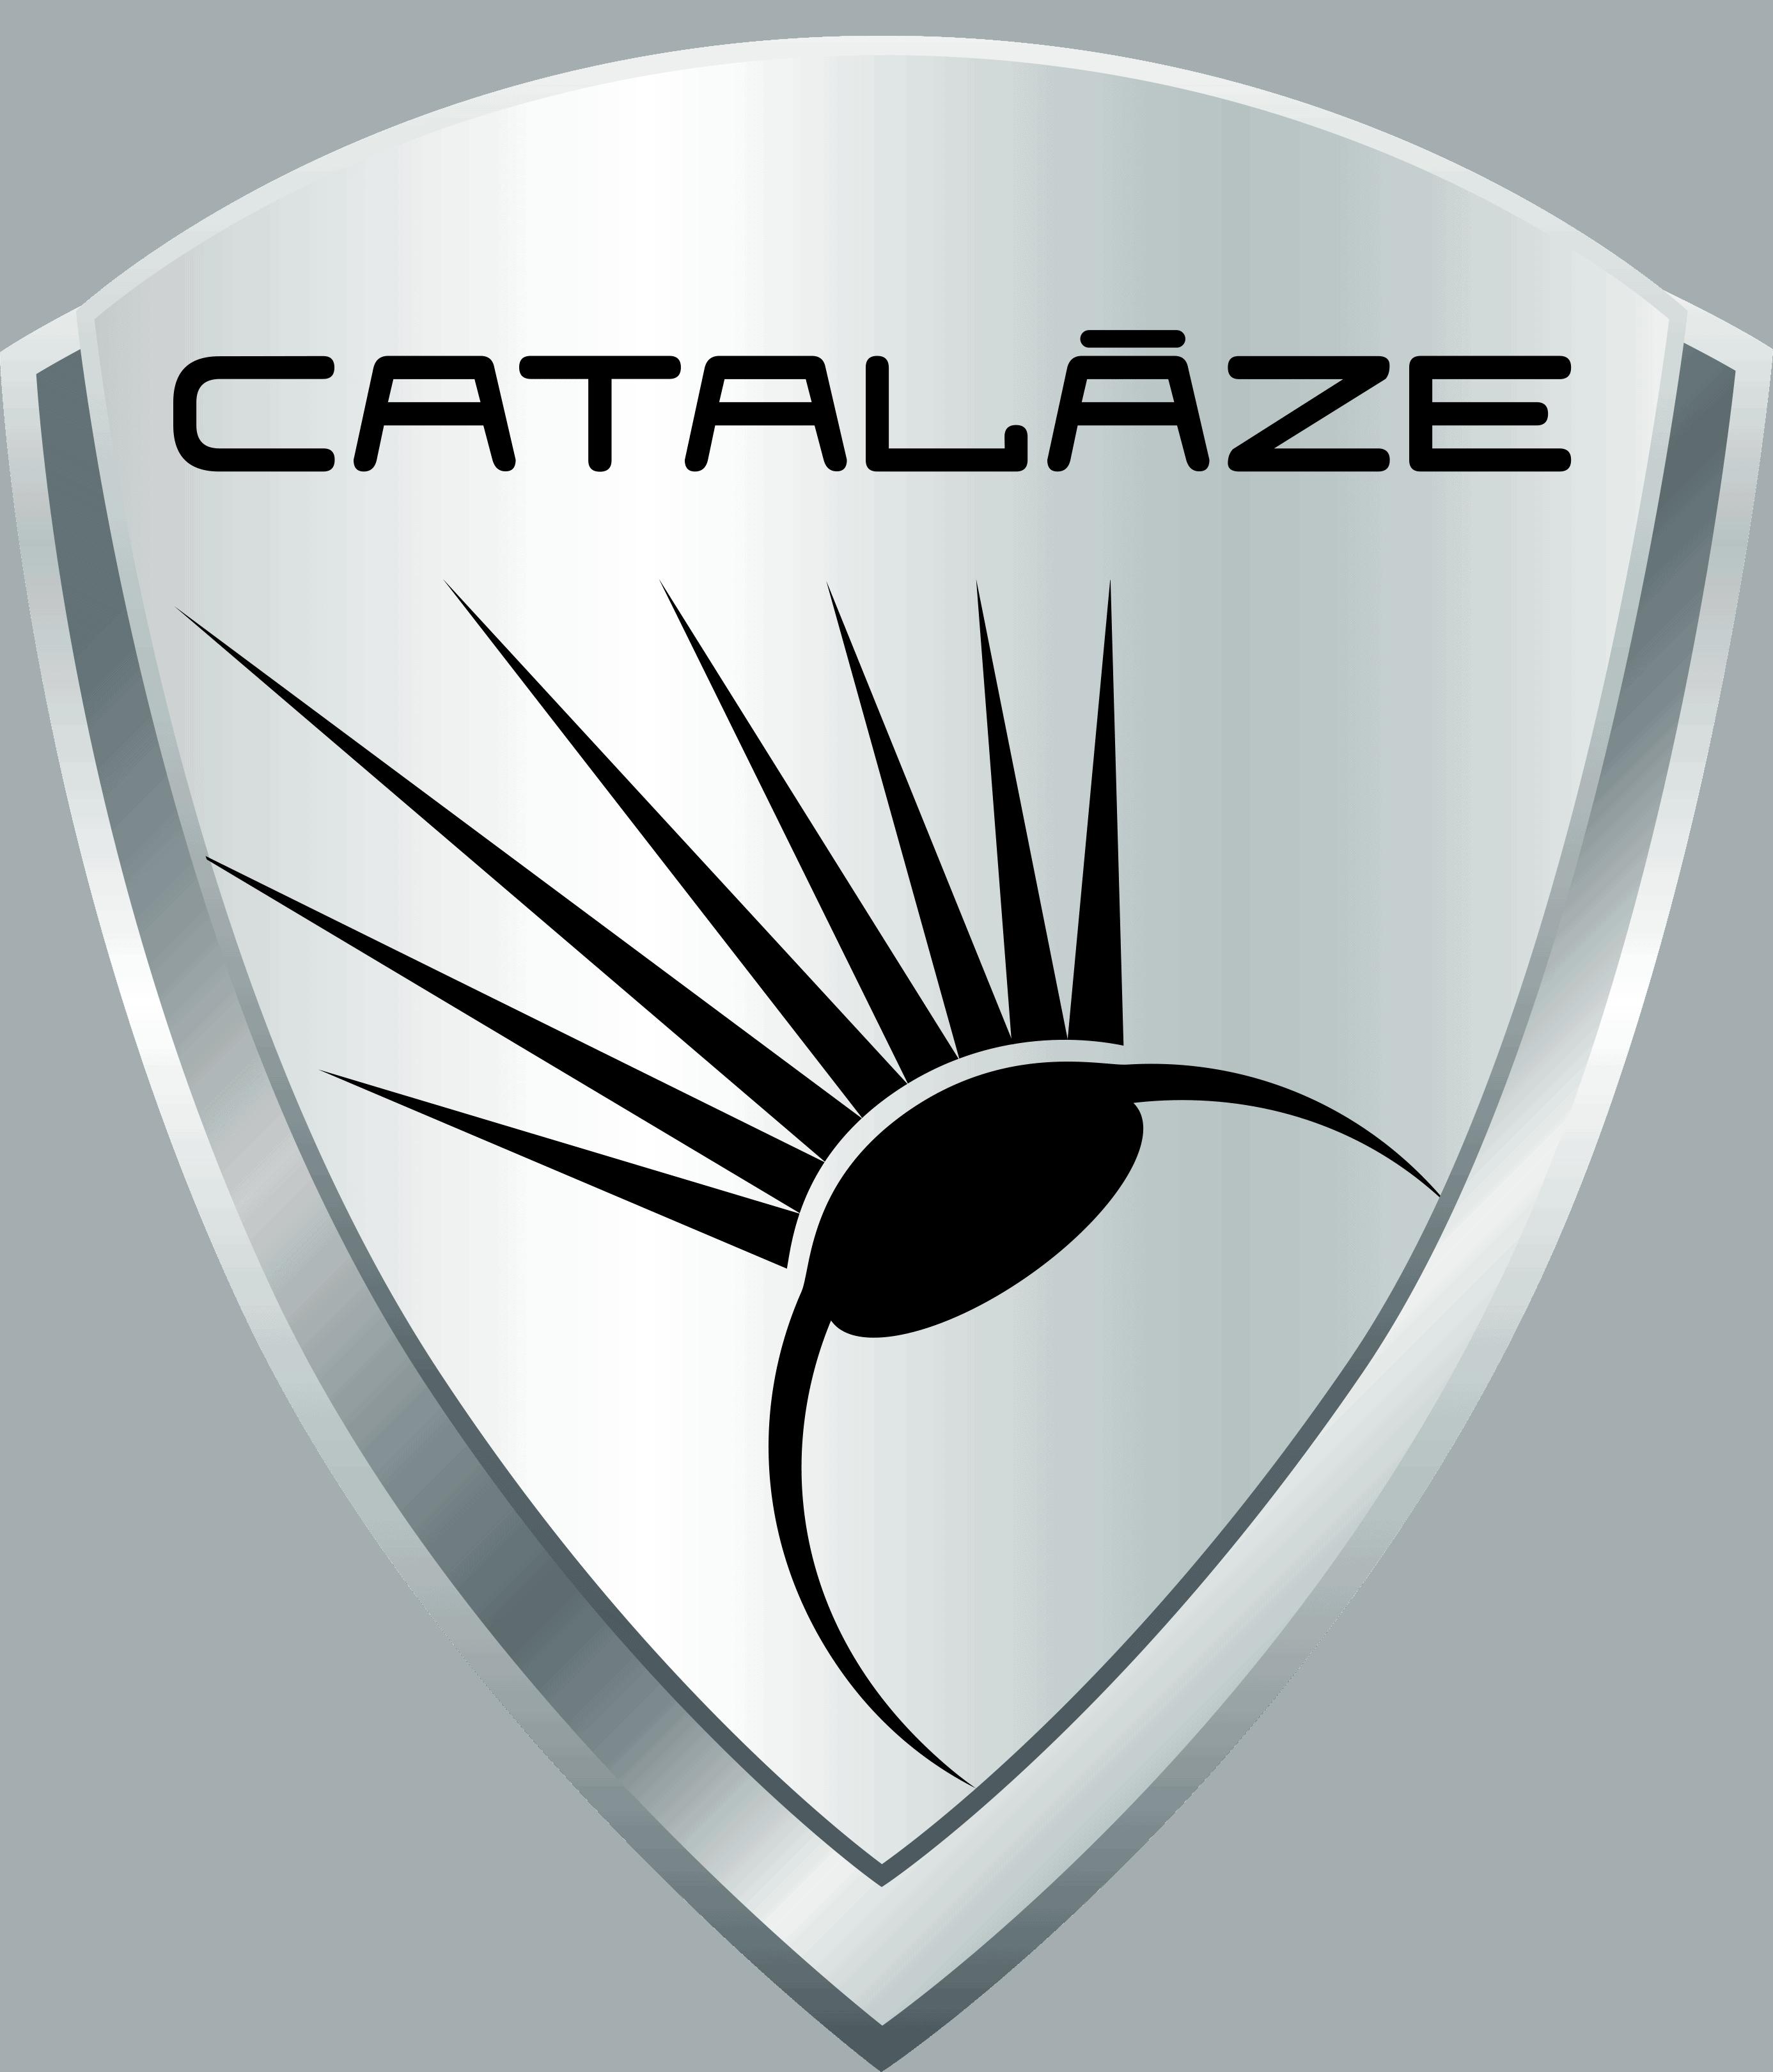 Catalaze cataract removal surgery icon